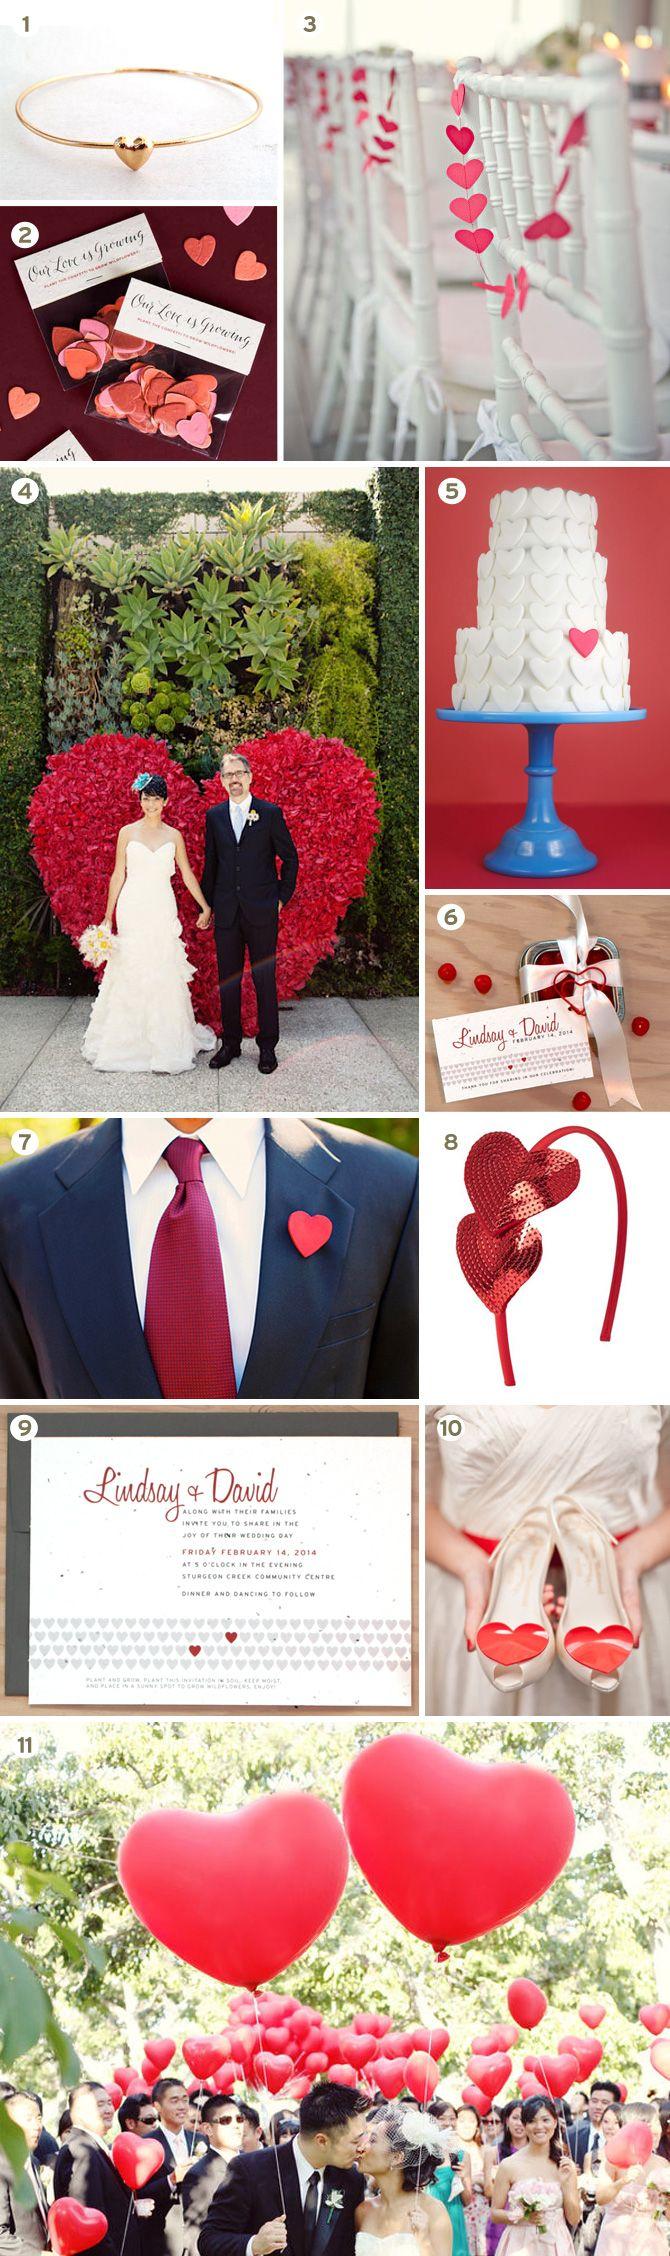 Inspiration Board Heart Theme Wedding Ideas Heart Themed Wedding Red Wedding Theme Valentines Day Weddings